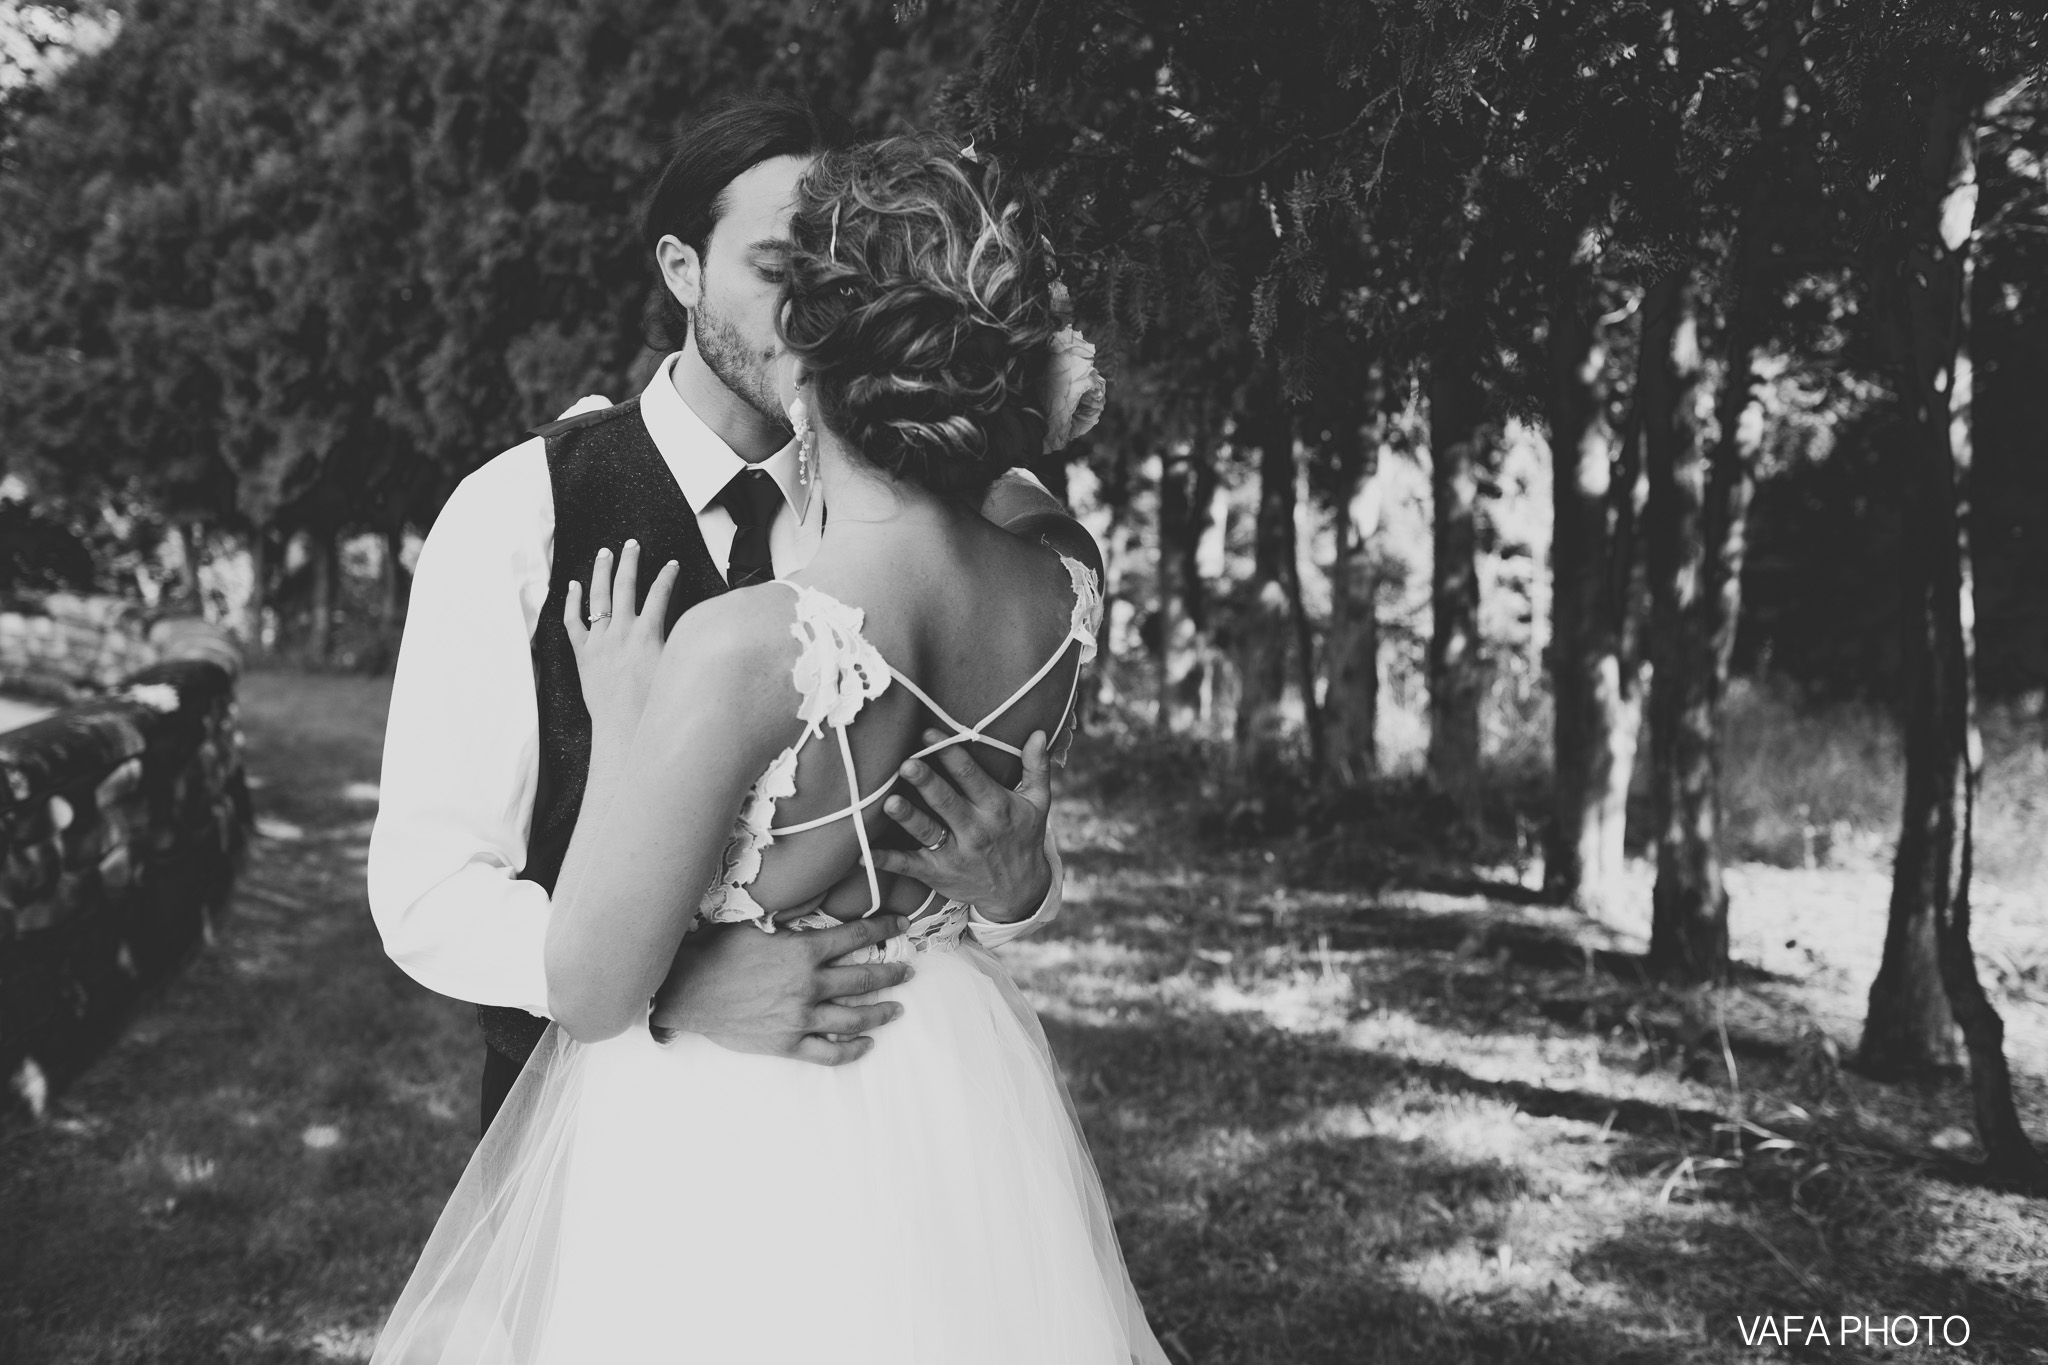 The-Felt-Estate-Wedding-Kailie-David-Vafa-Photo-648.jpg